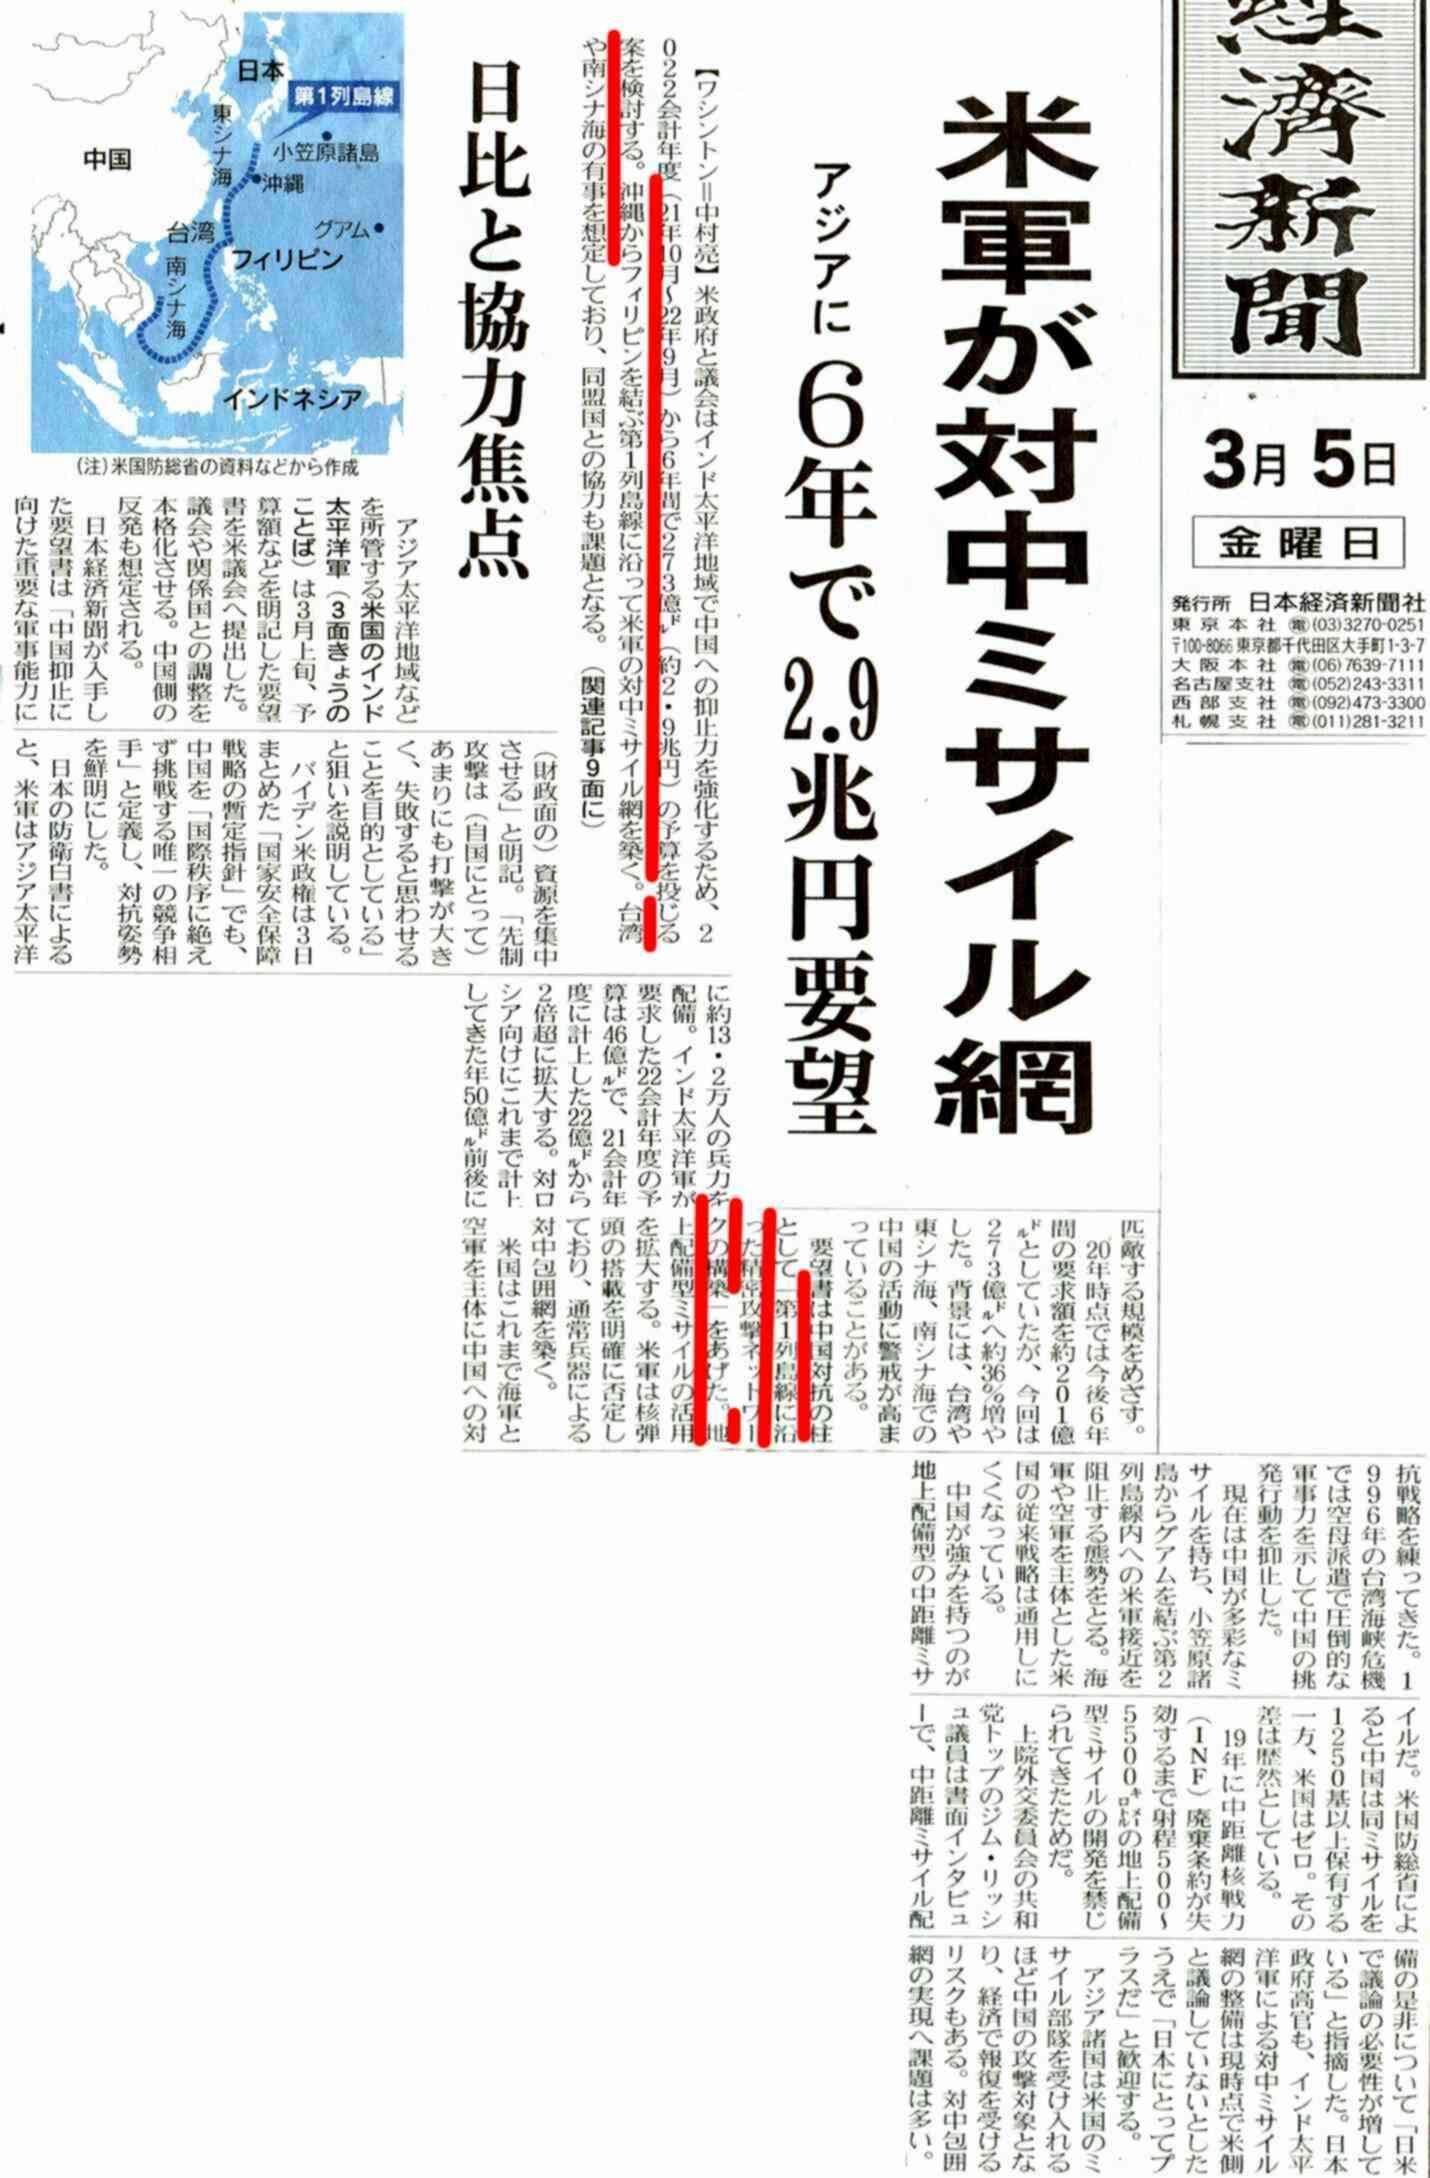 Nikkei2021 03051a